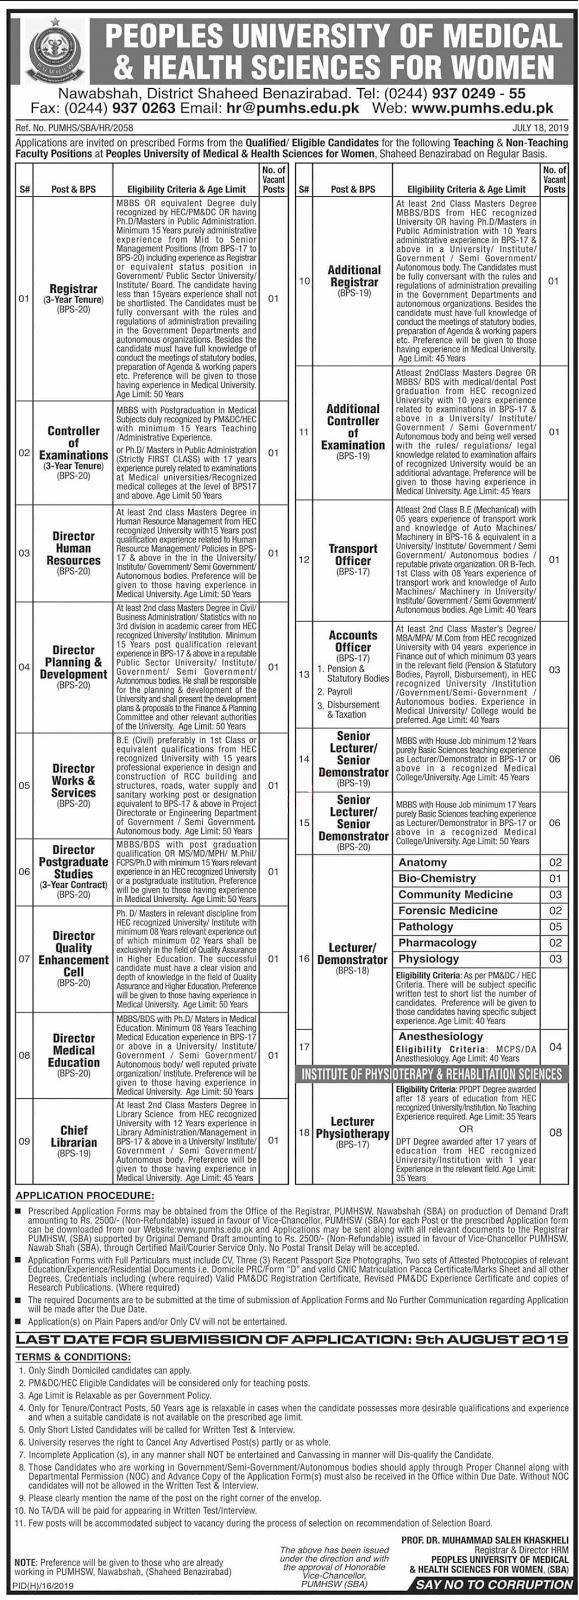 Peoples University PUMHS Shaheed Benazirabad Jobs 2019 Latest